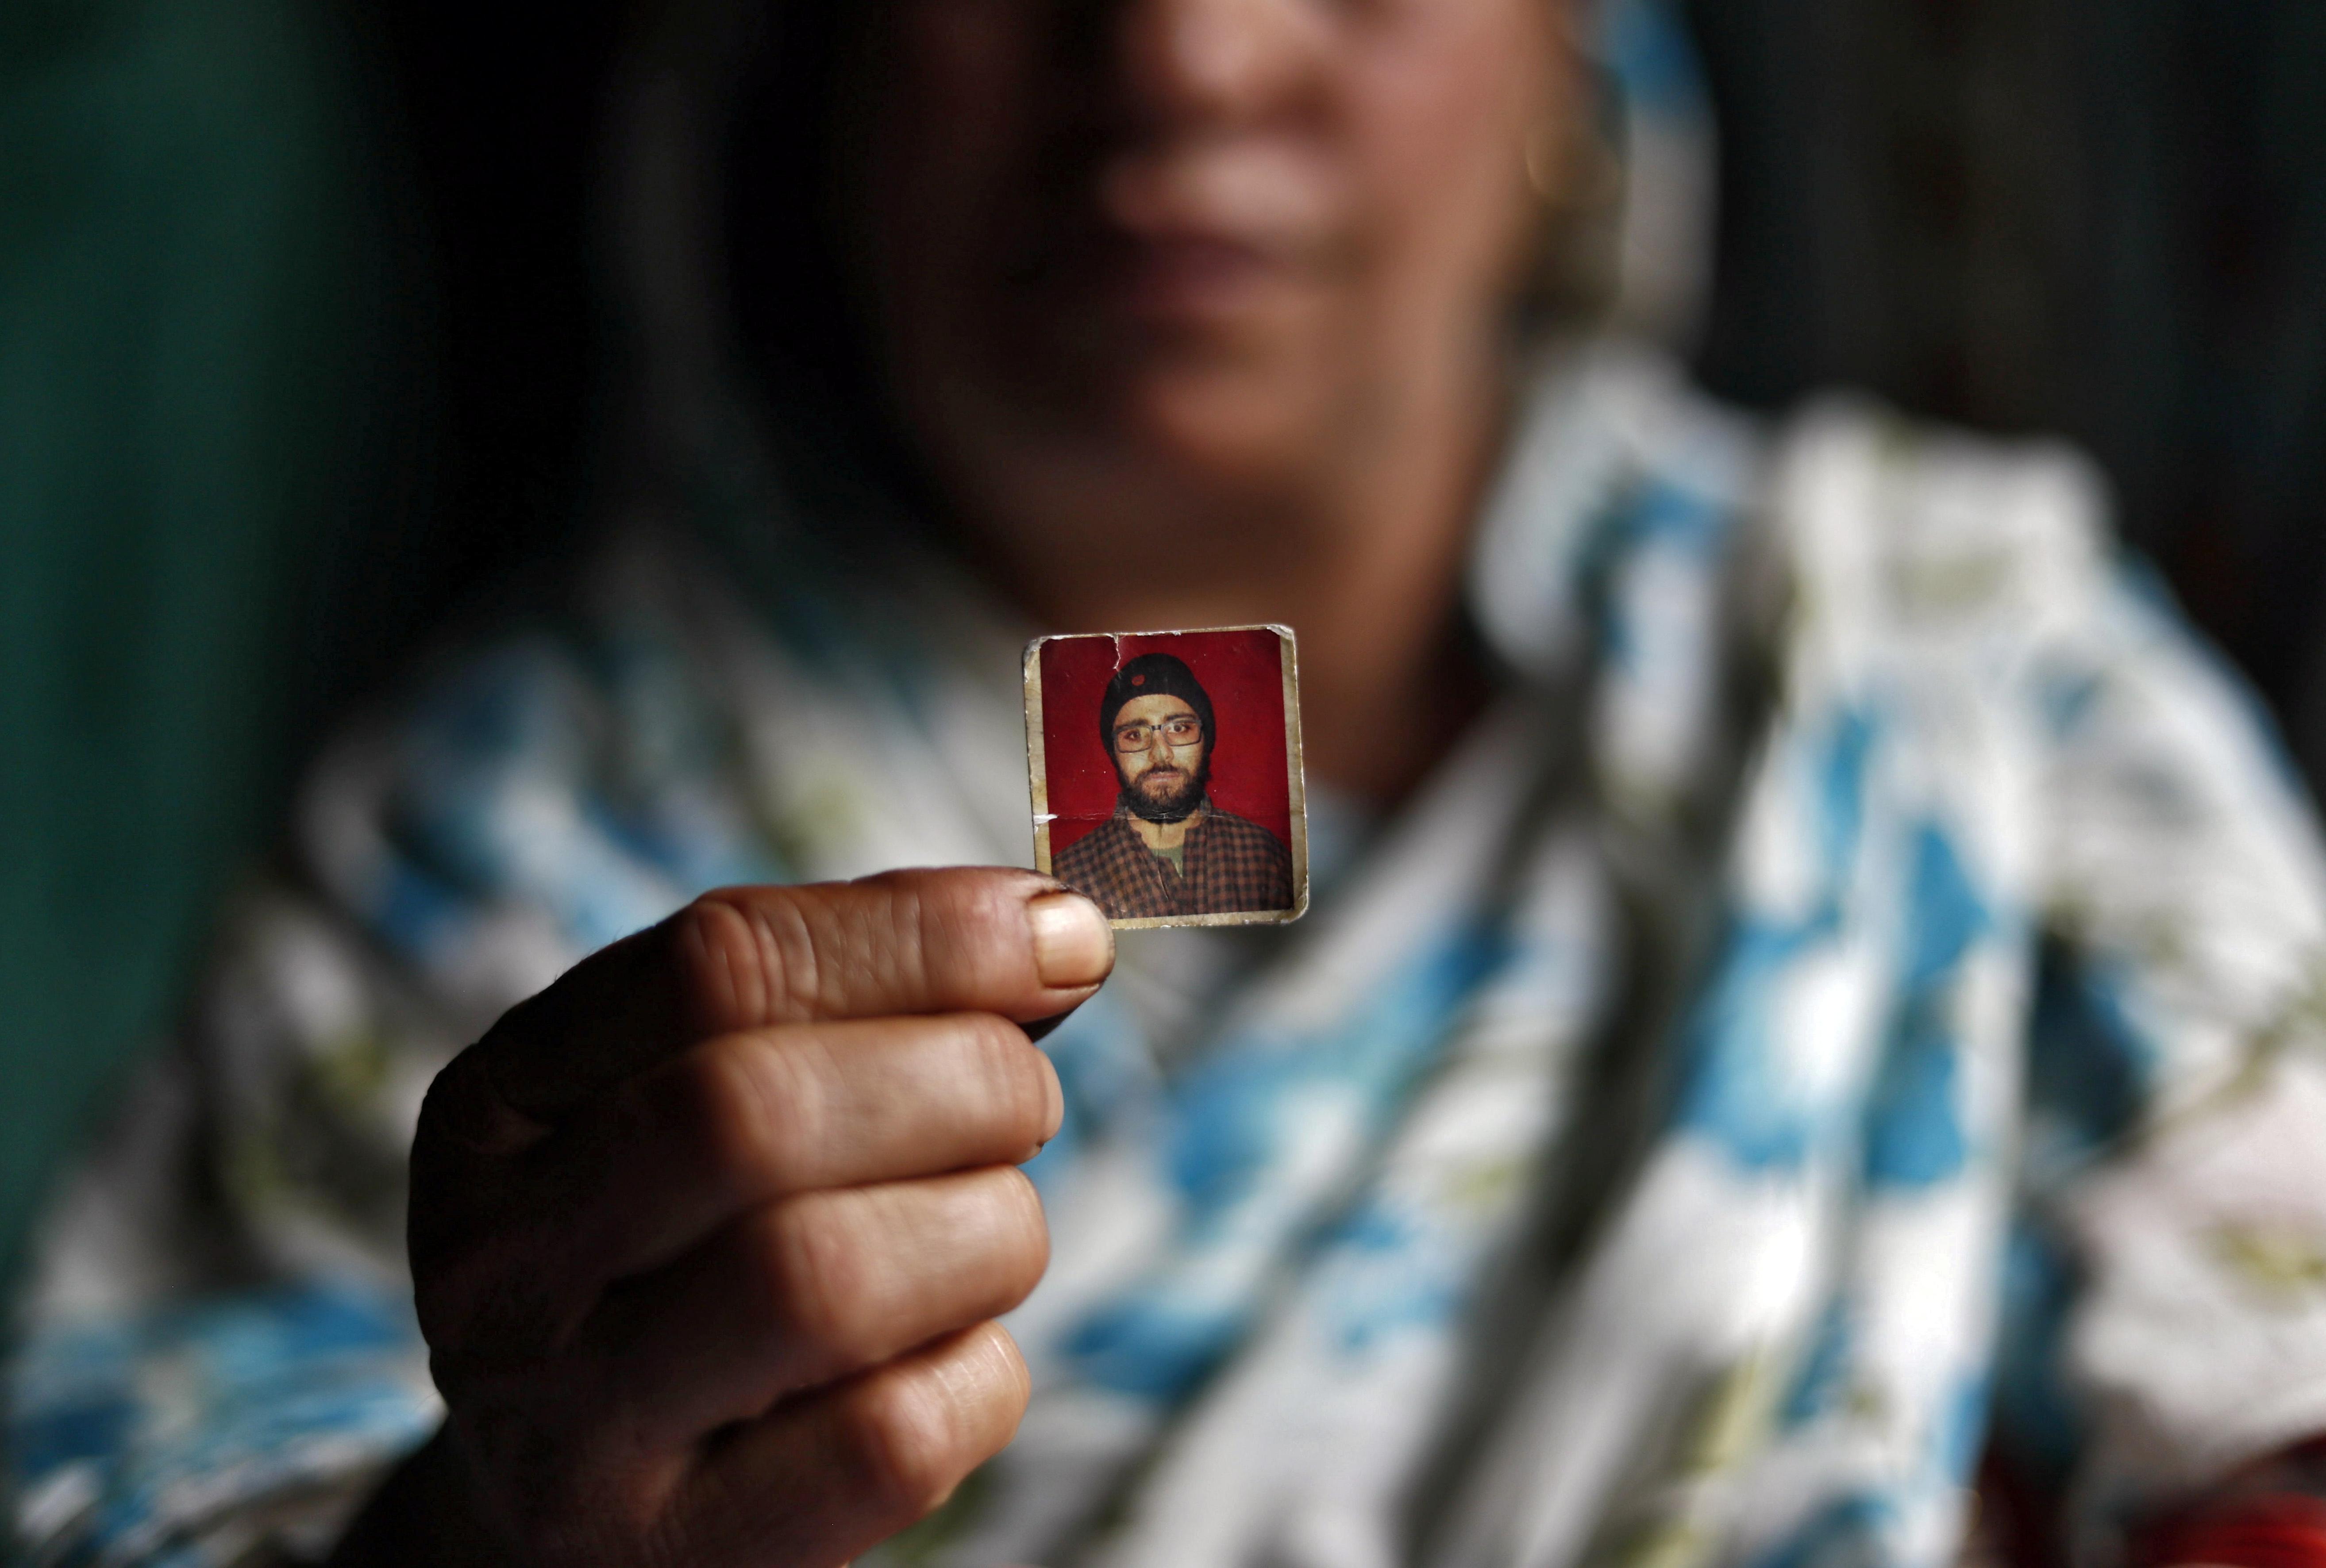 The transported: Kashmiri prisoners sent far from home